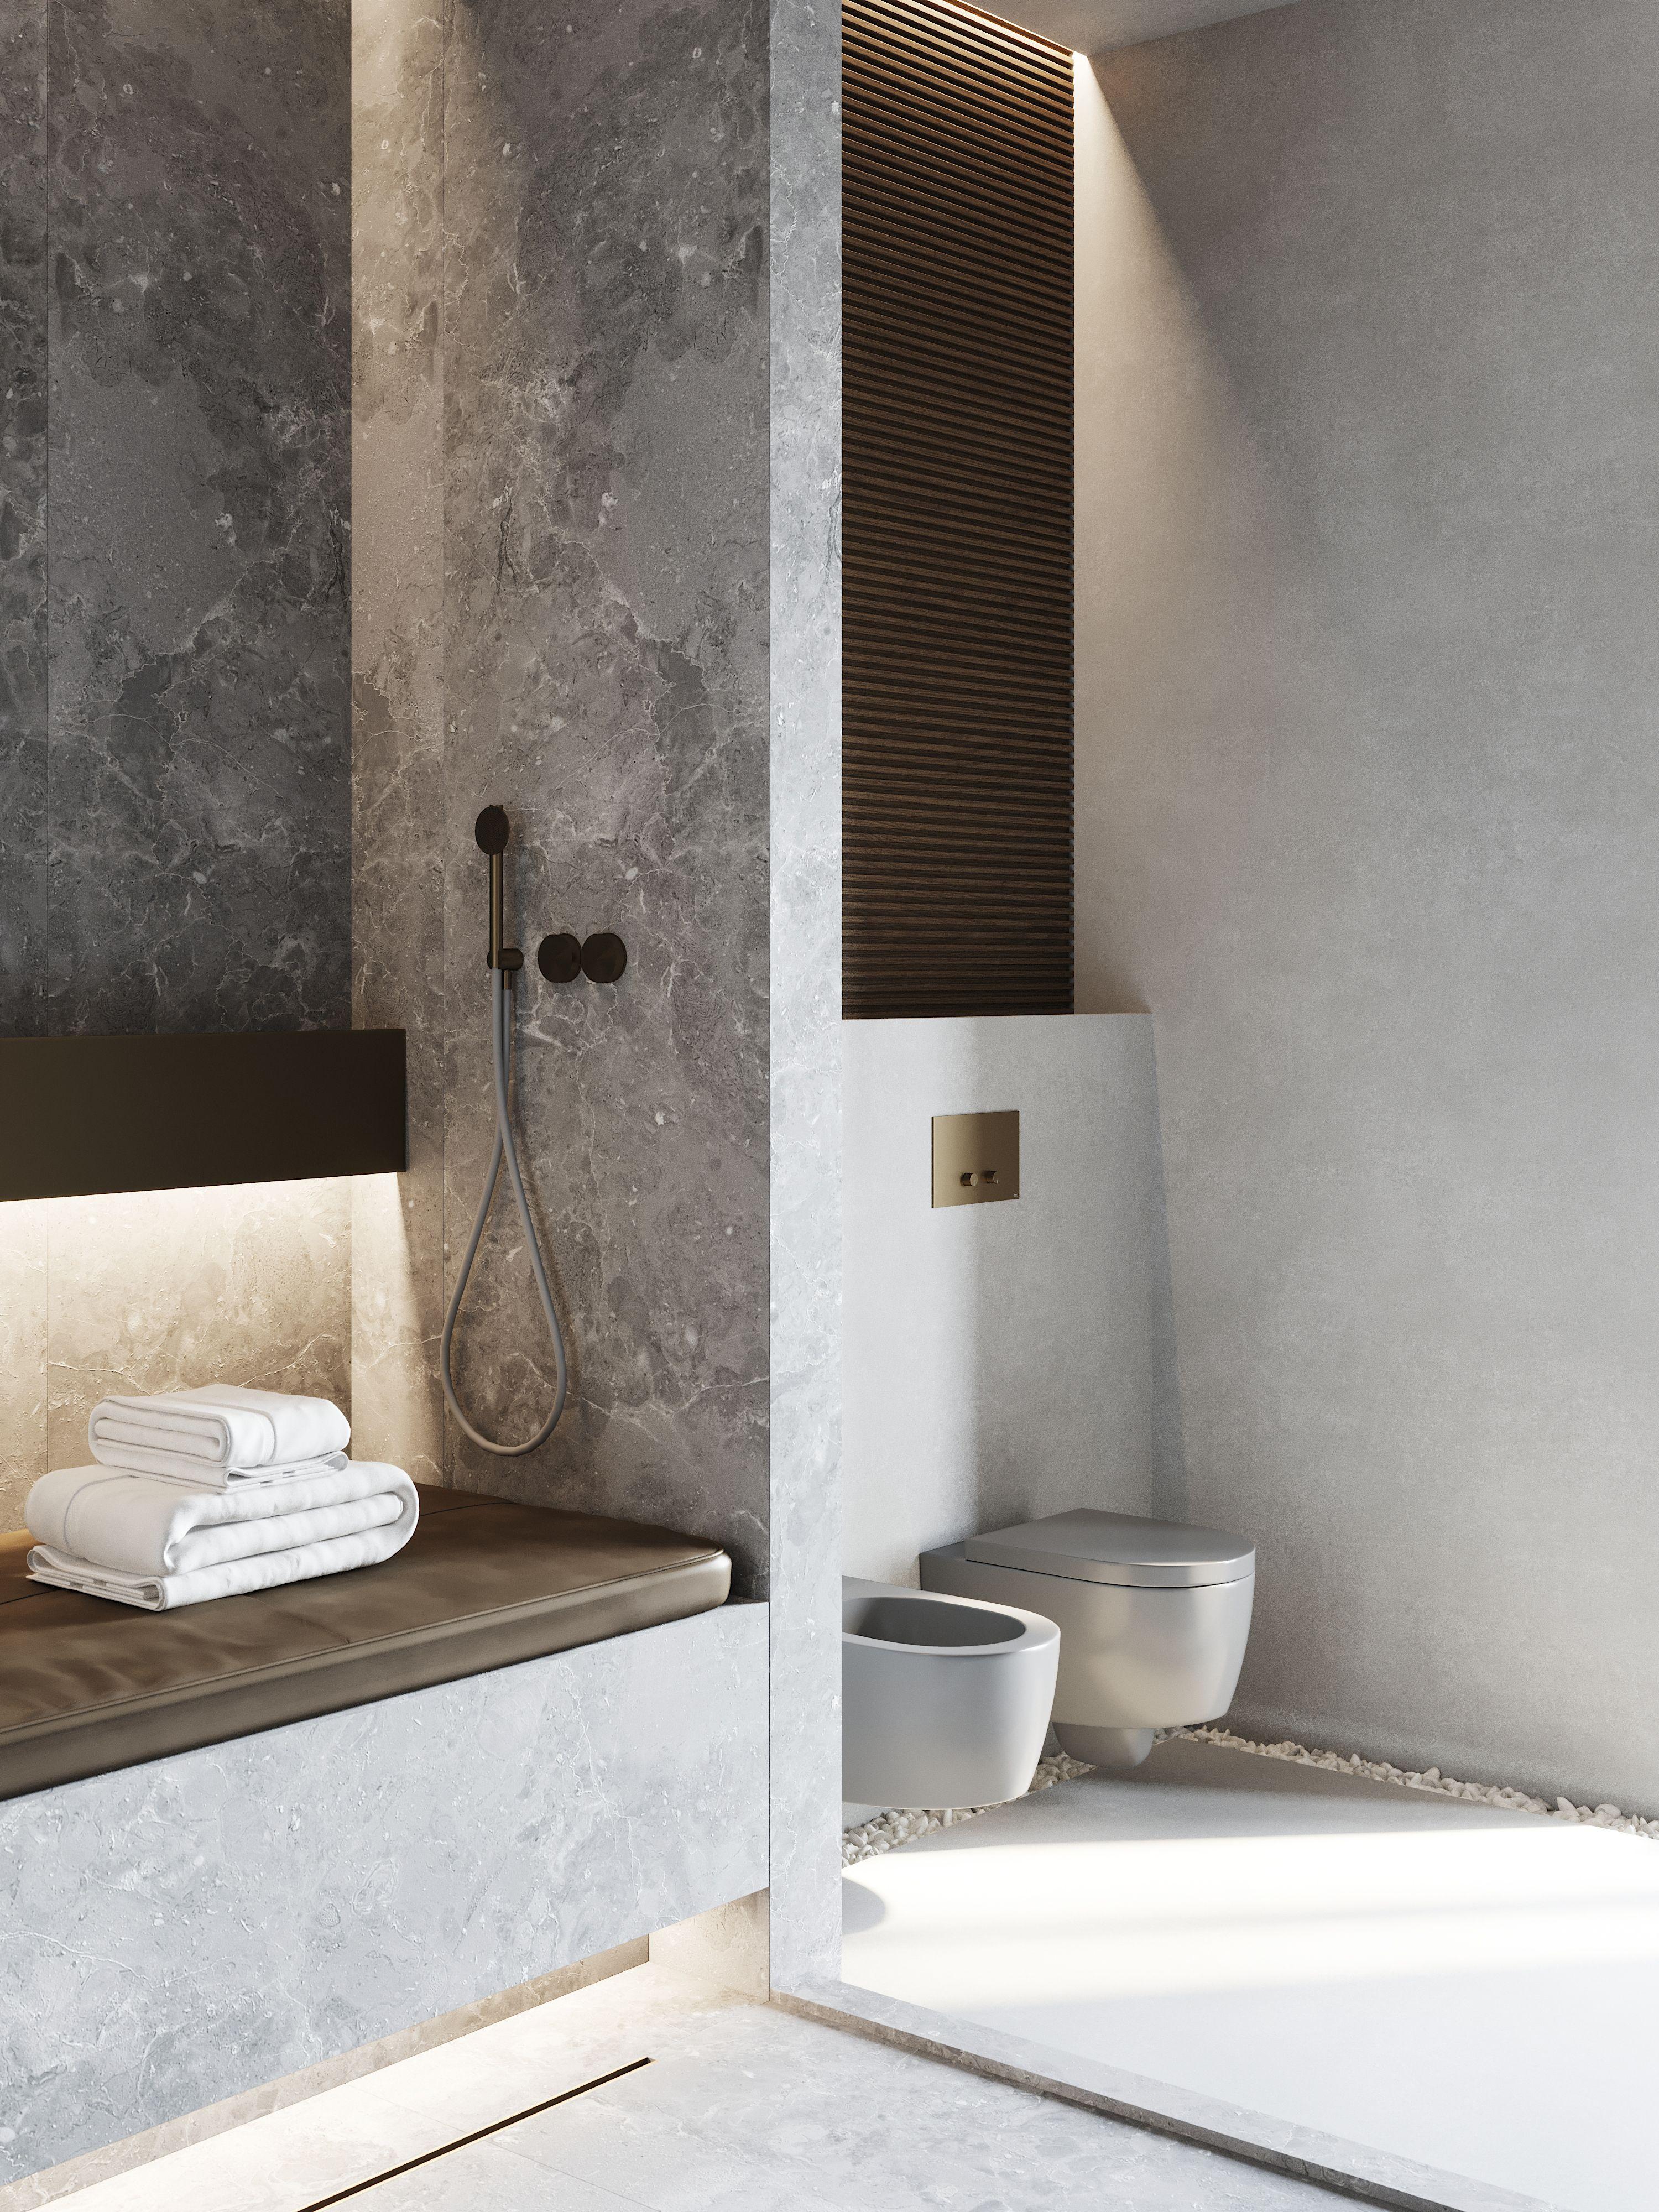 bathroom  Bathroom design, Bathroom interior design, Home decor